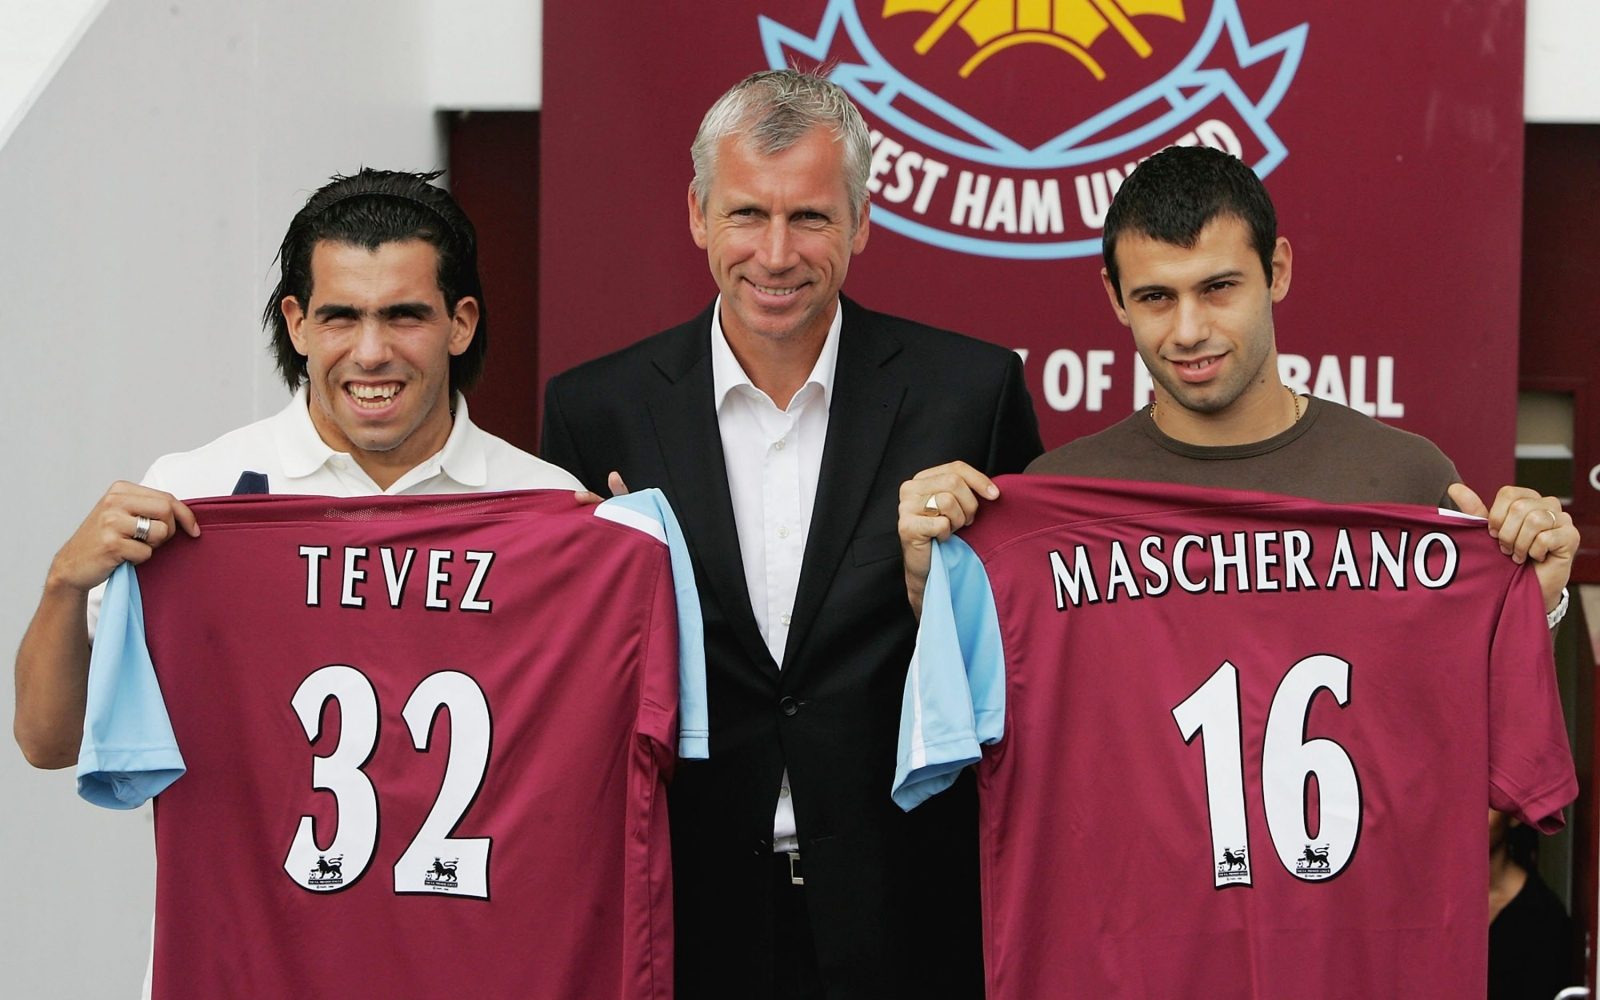 Tevez and Mascherano